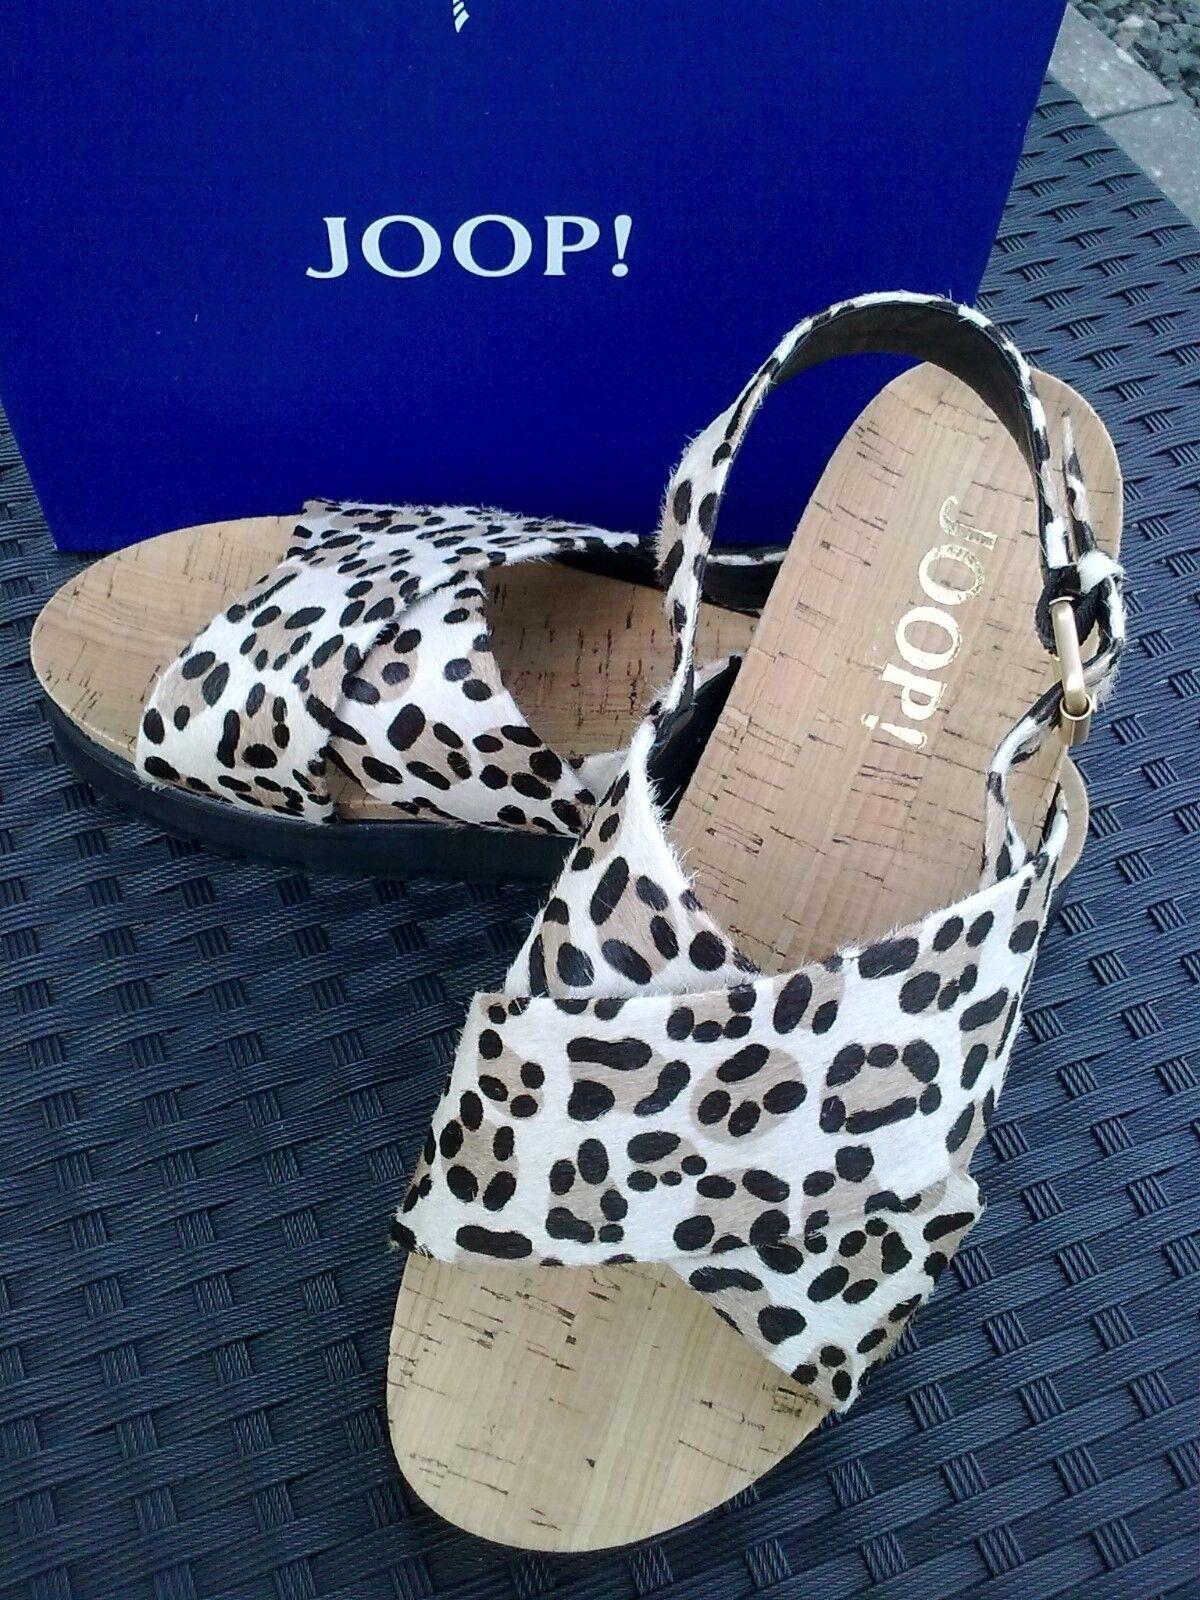 Joop Sandale, Schuhe, Plateau Sandale, Leder, Neu, Gr. 41 / 7